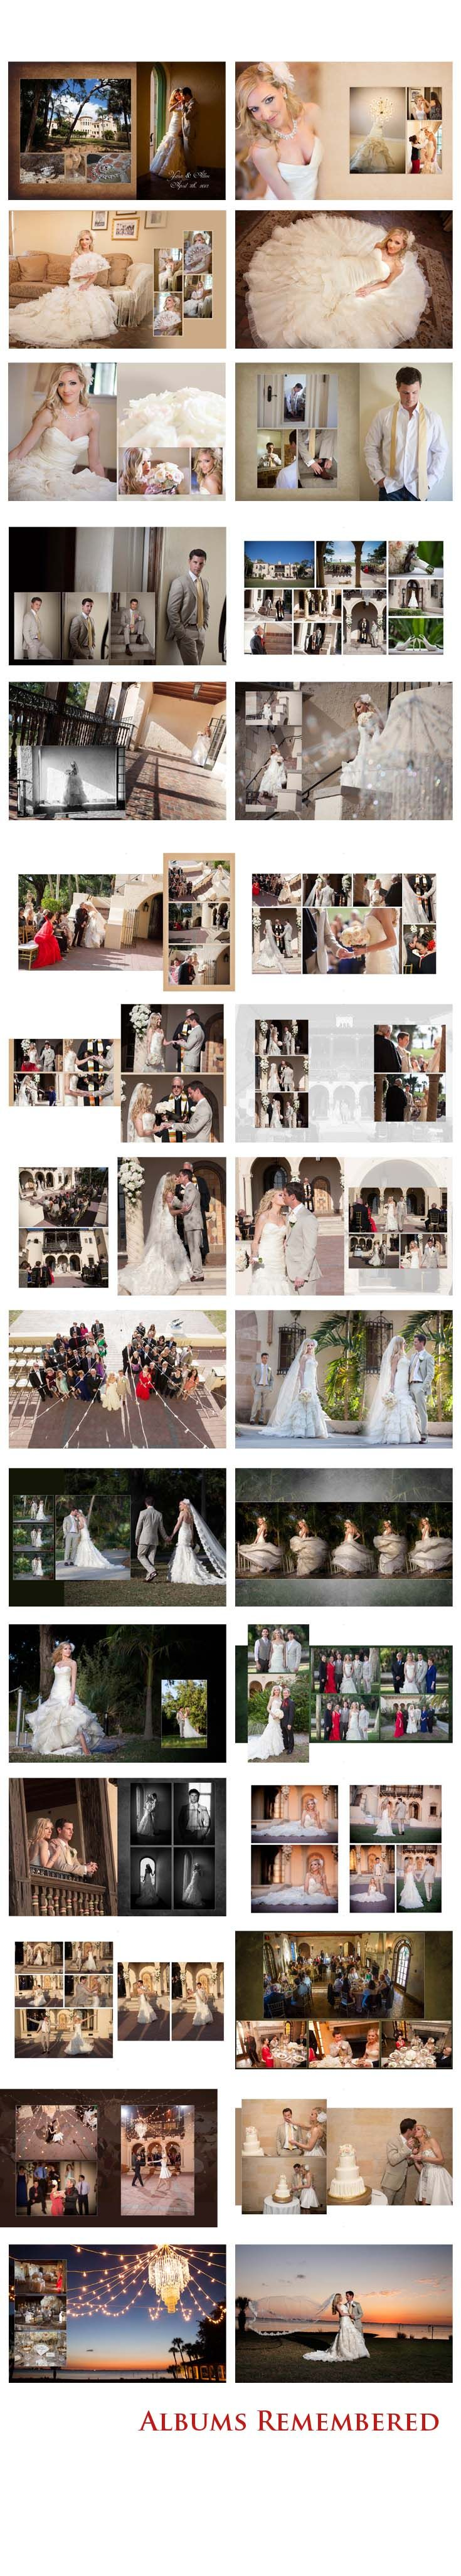 http://www.albumsremembered.com/design-gallery/weddings Free #wedding #album #design